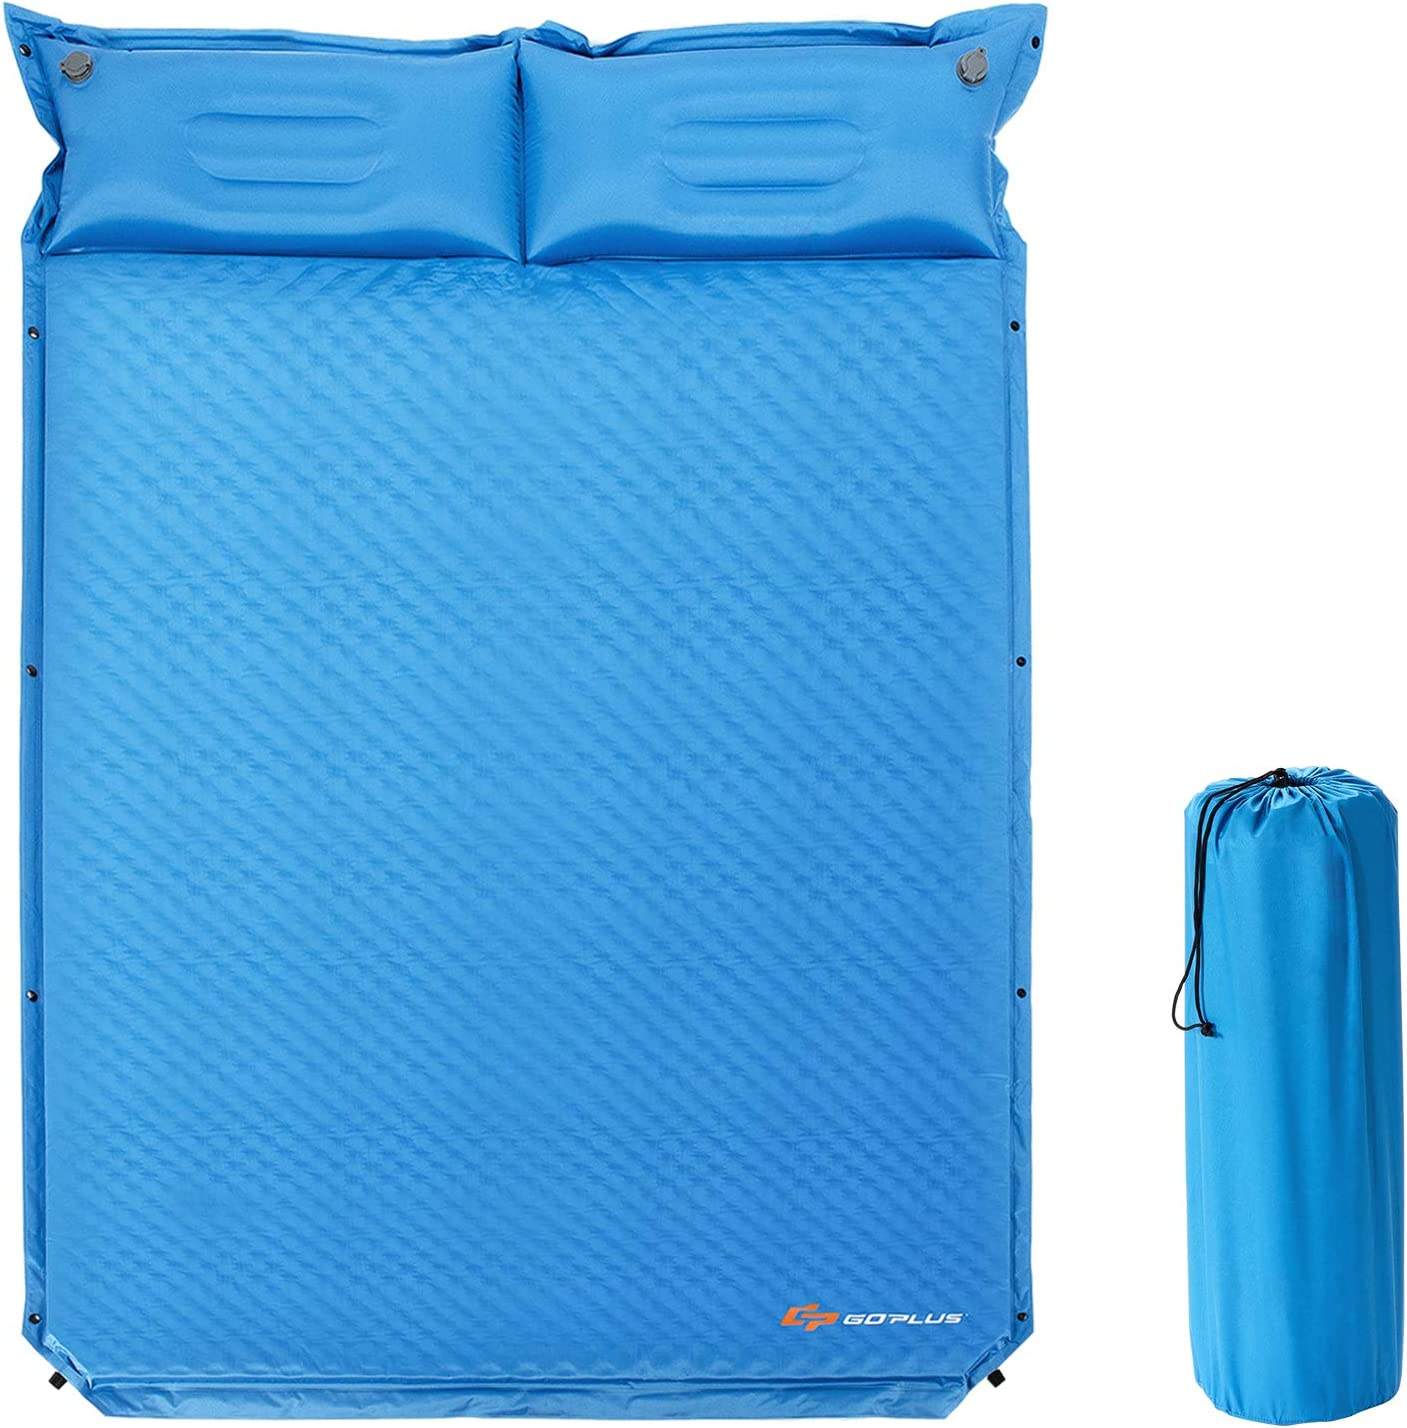 Goplus Camping Sleeping Pad Foam Bargain P w Mat Arlington Mall Self-Inflating